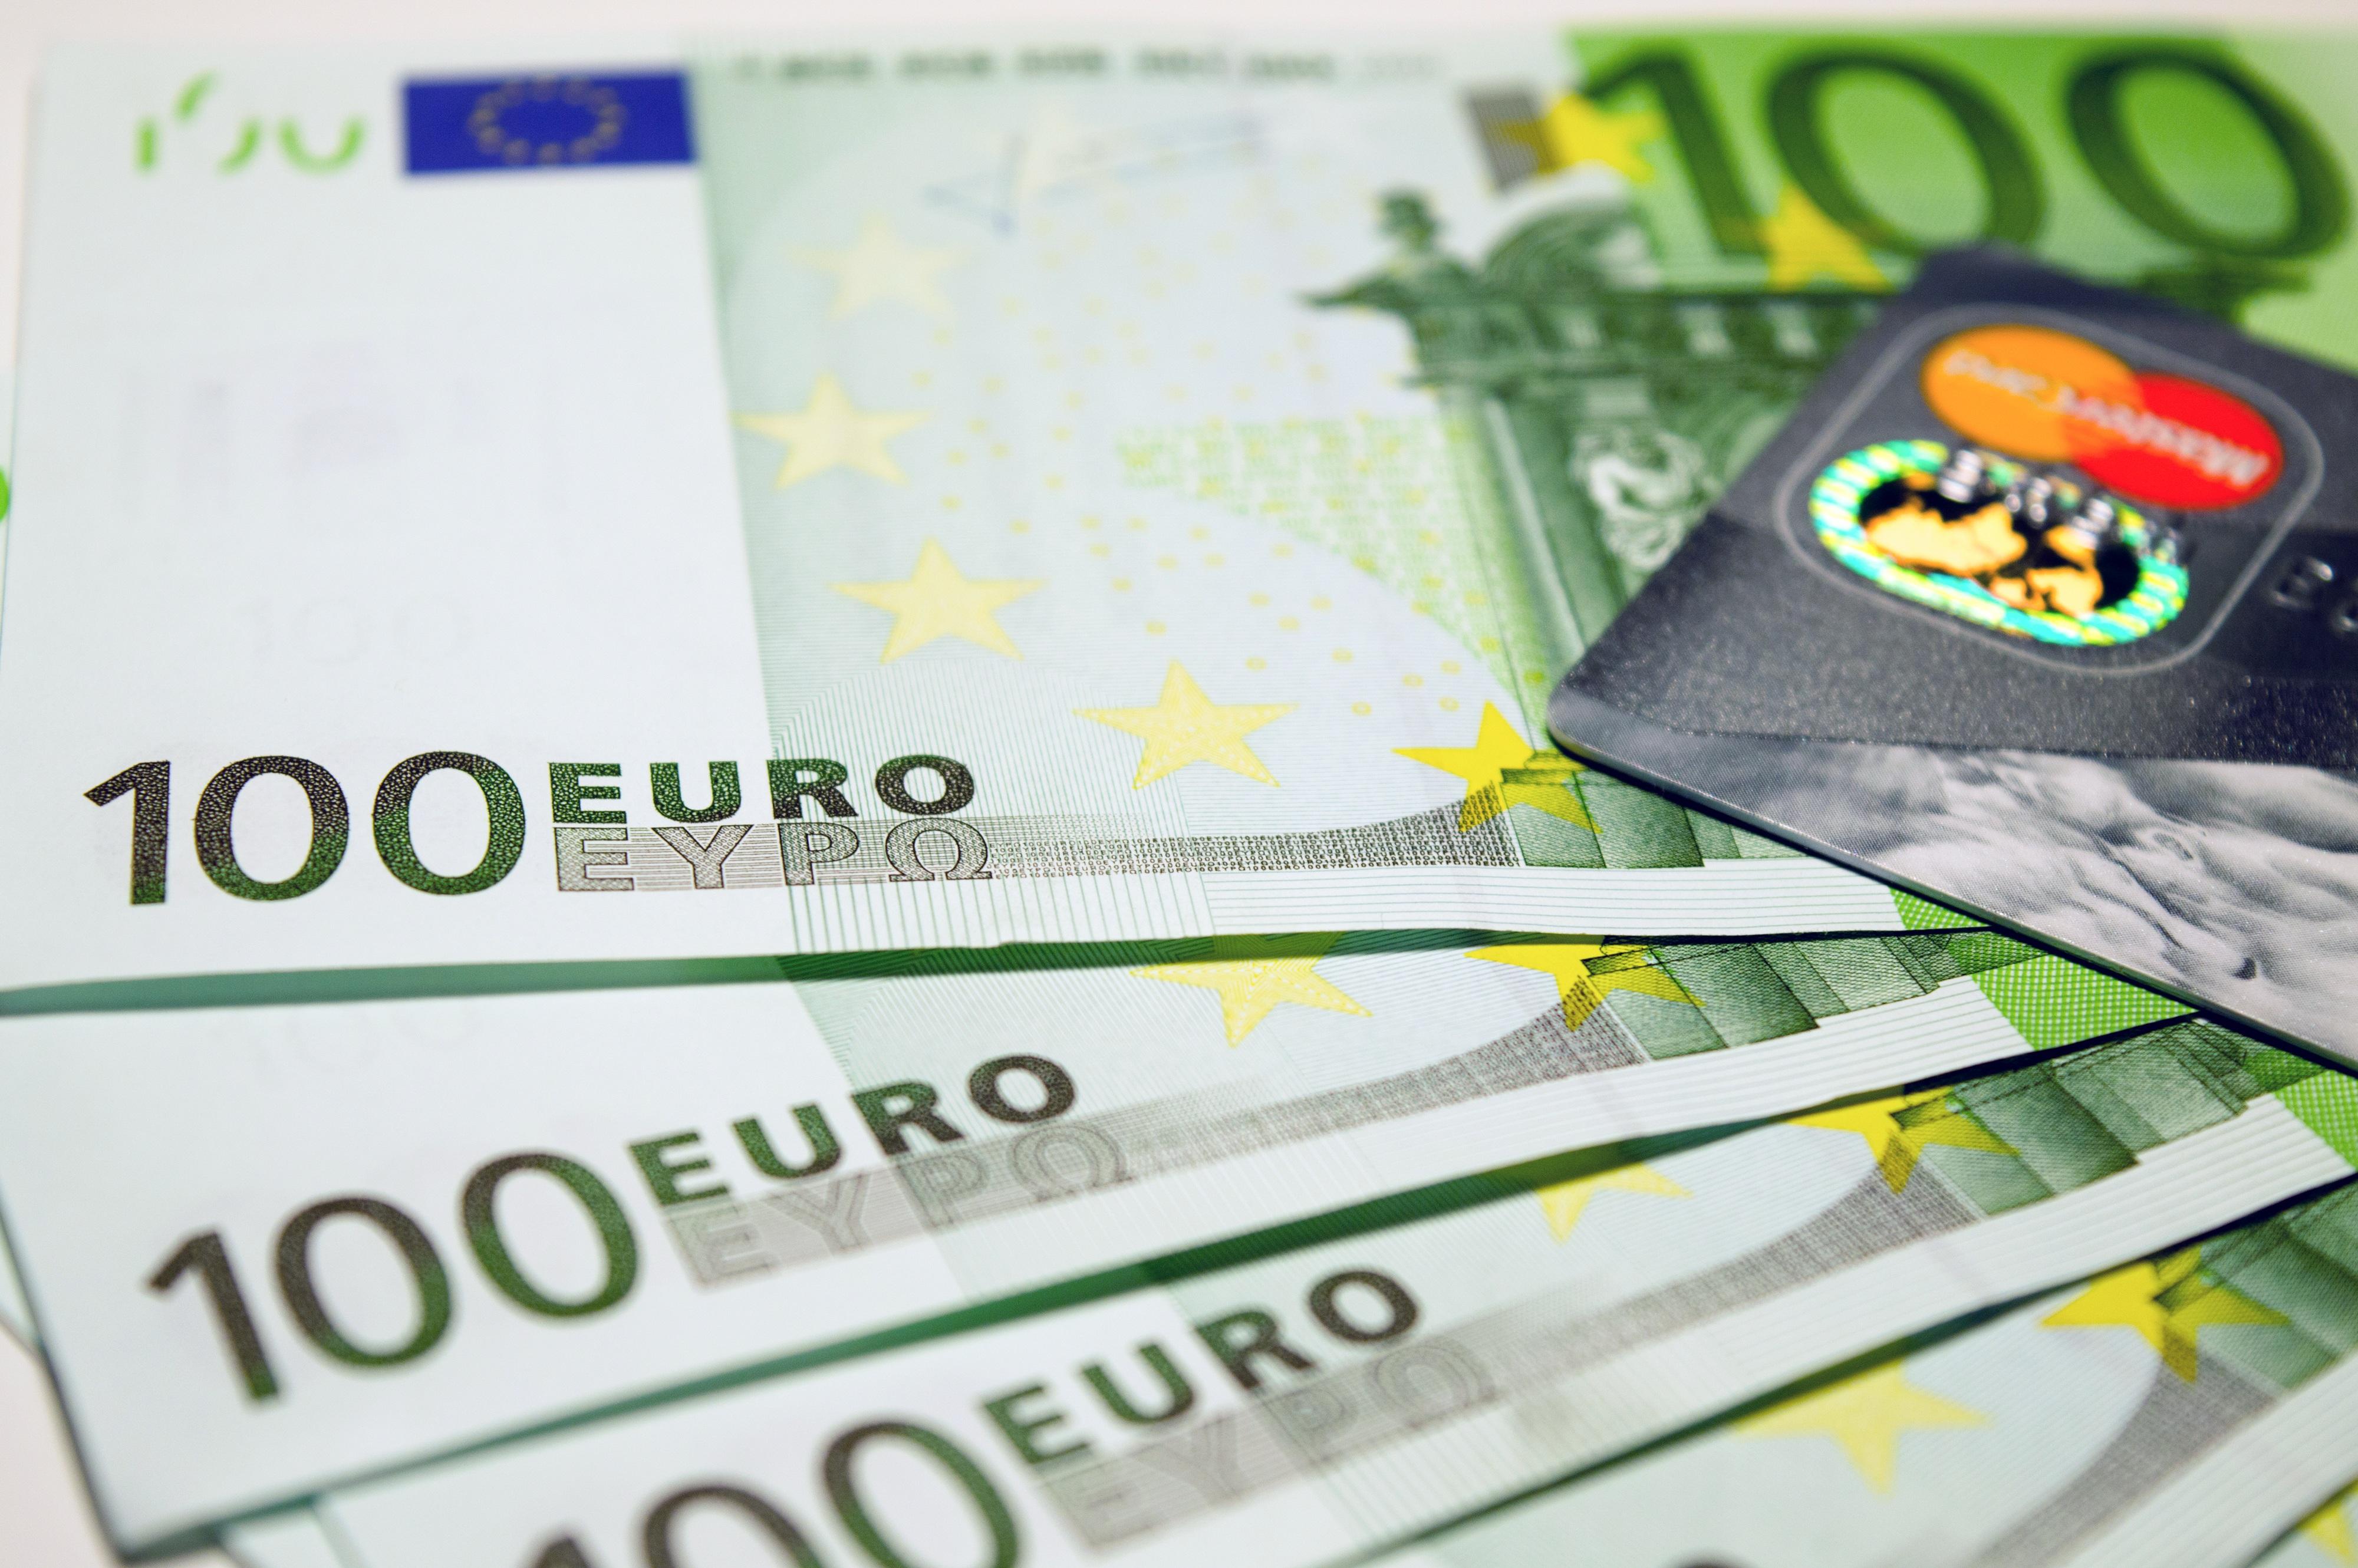 Moeda estrangeira - euro